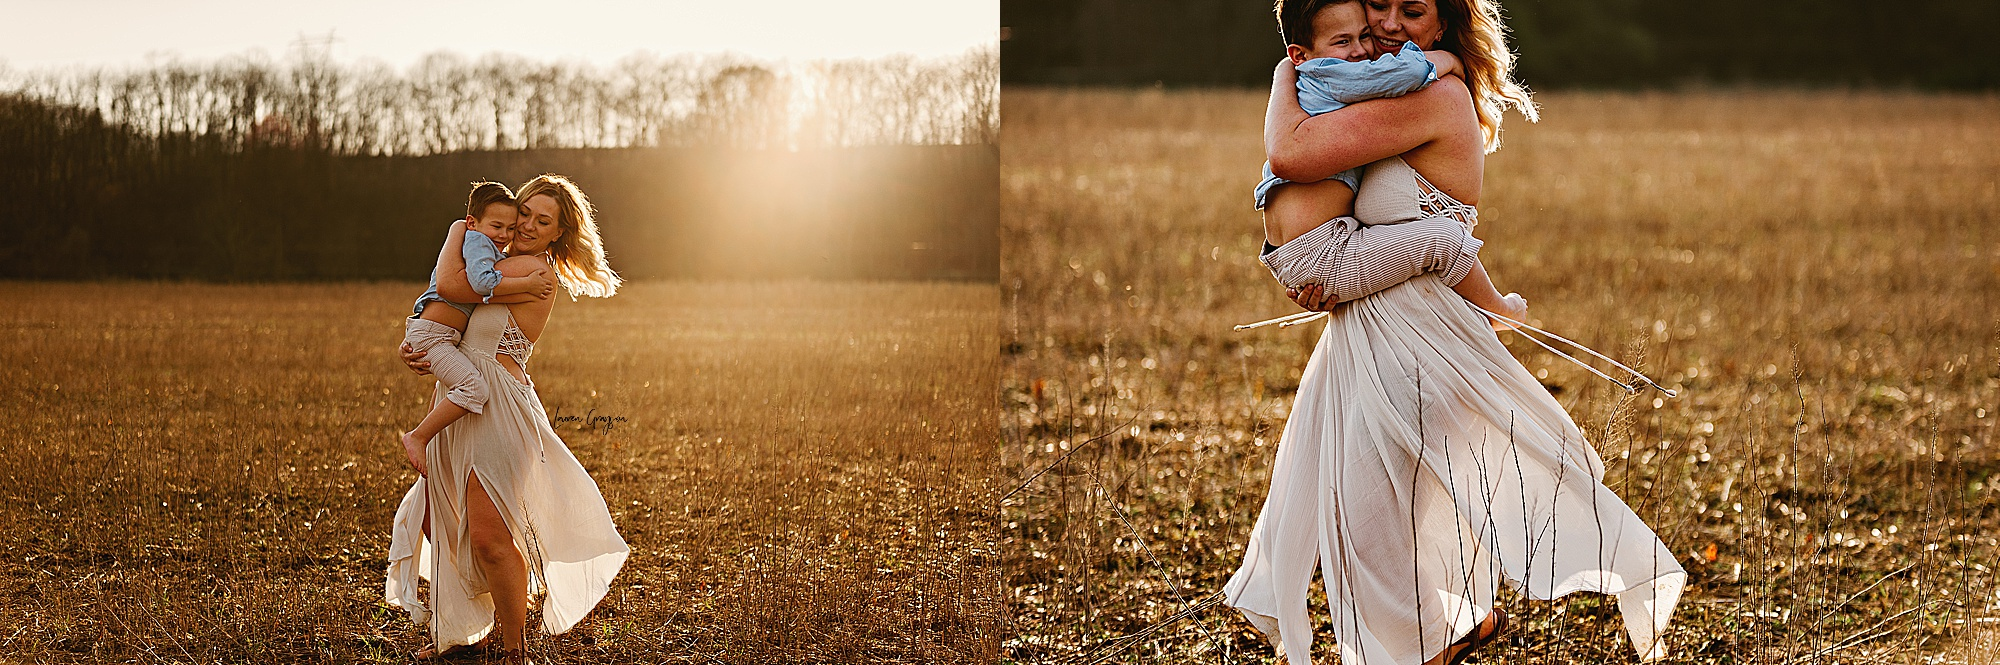 lauren-grayson-photography-akron-ohio-family-mom-boys-field-spring-outdoor-session_0006.jpg